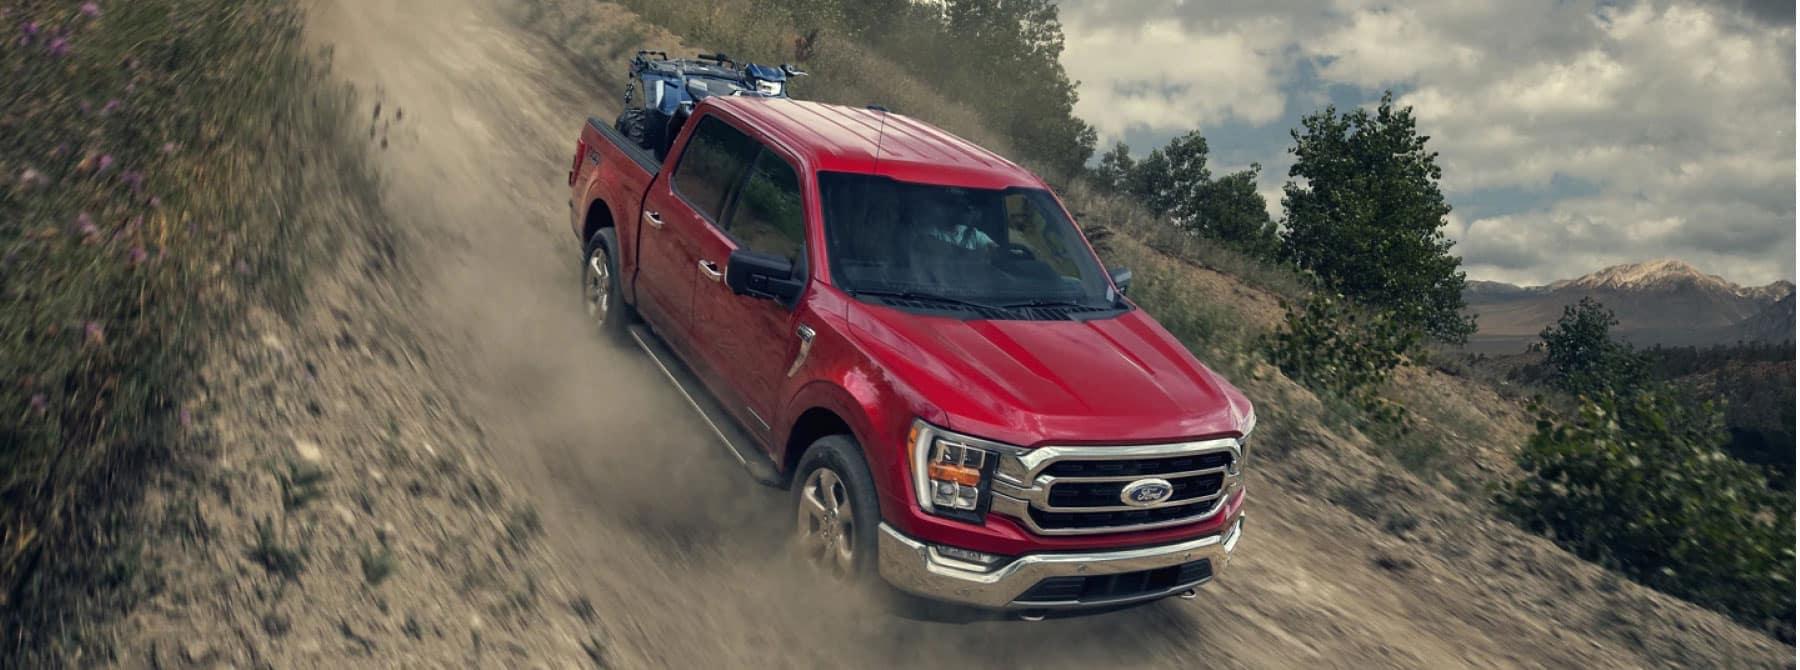 Truck driving down dirt road